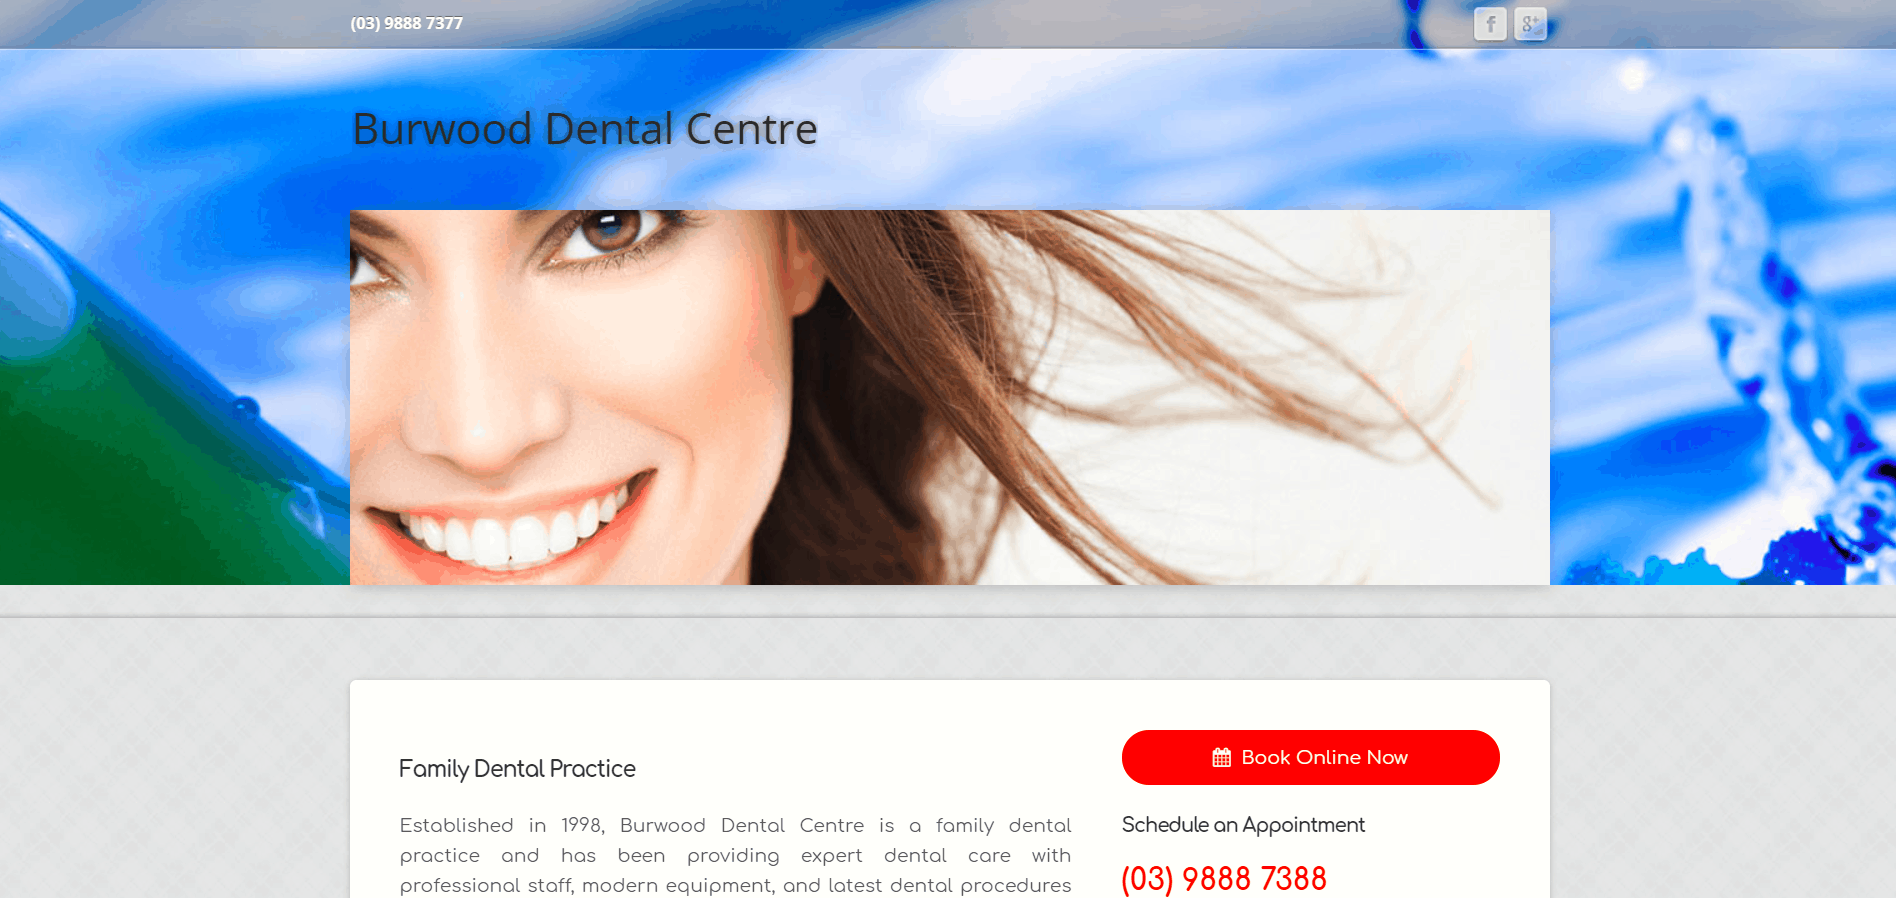 Burwood Dental Centre